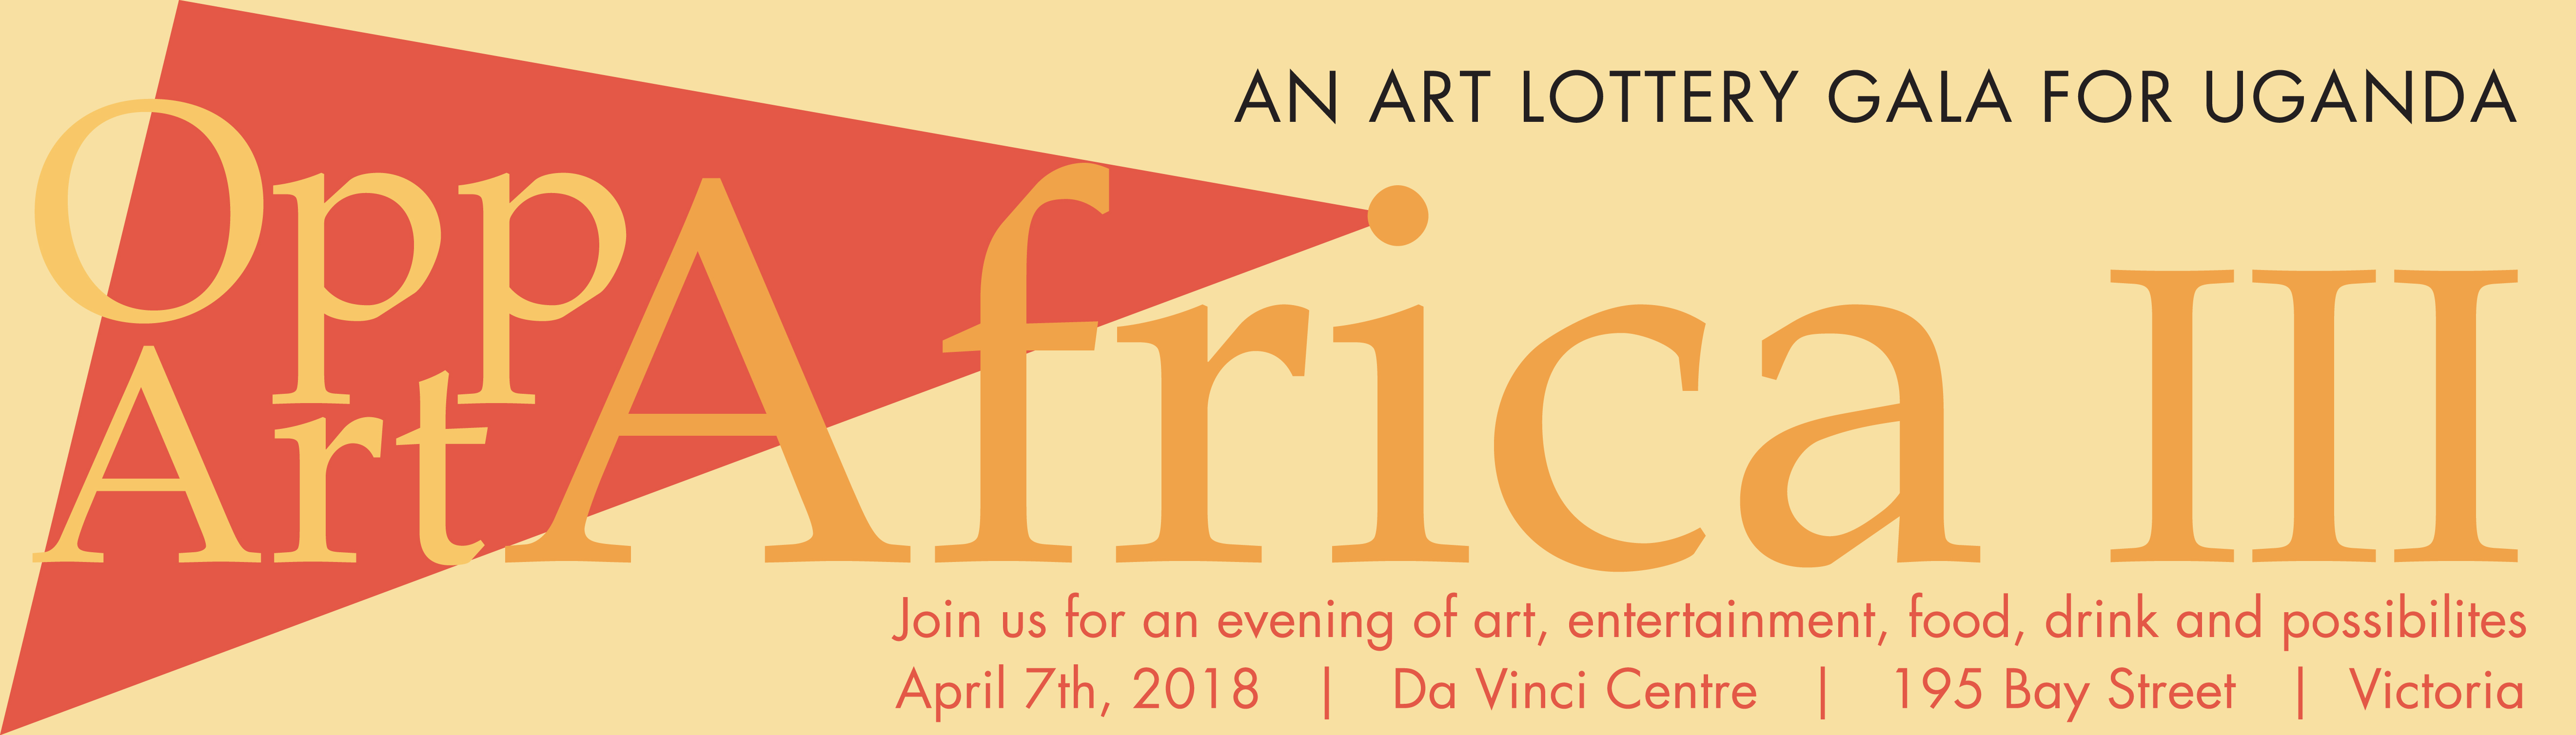 An Art Lottery Gala for Uganda